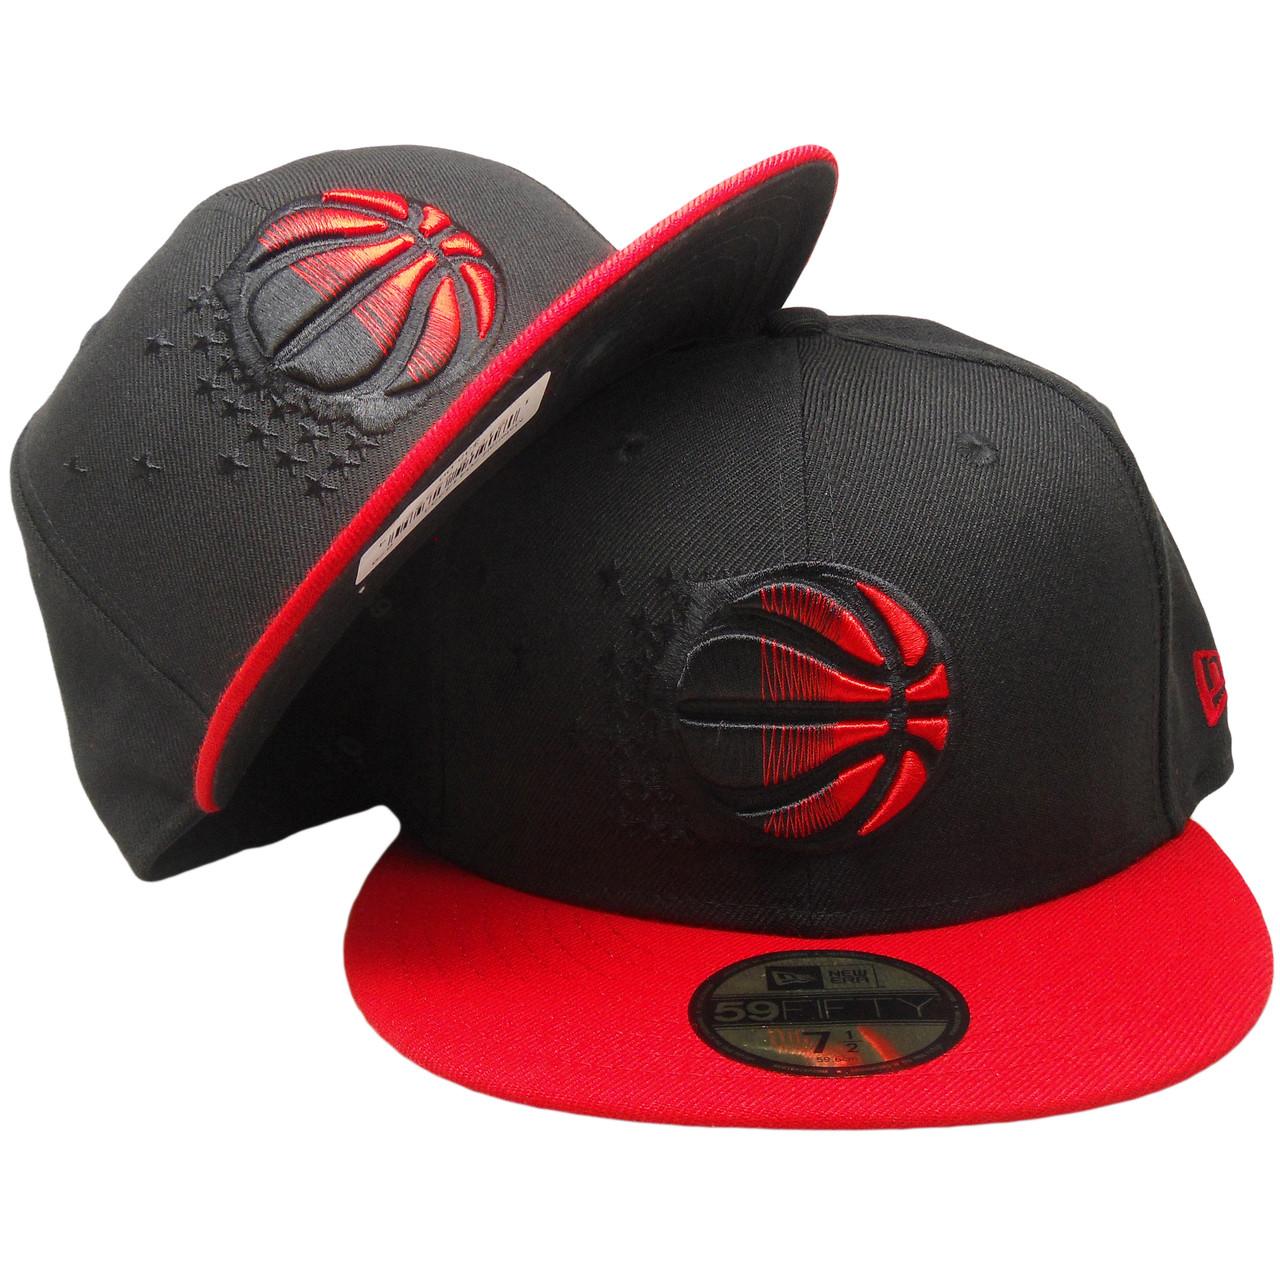 8e1577e5 Orlando Magic New Era Custom 59Fifty Fitted Hat - Black, Red -  ECapsUnlimited.com